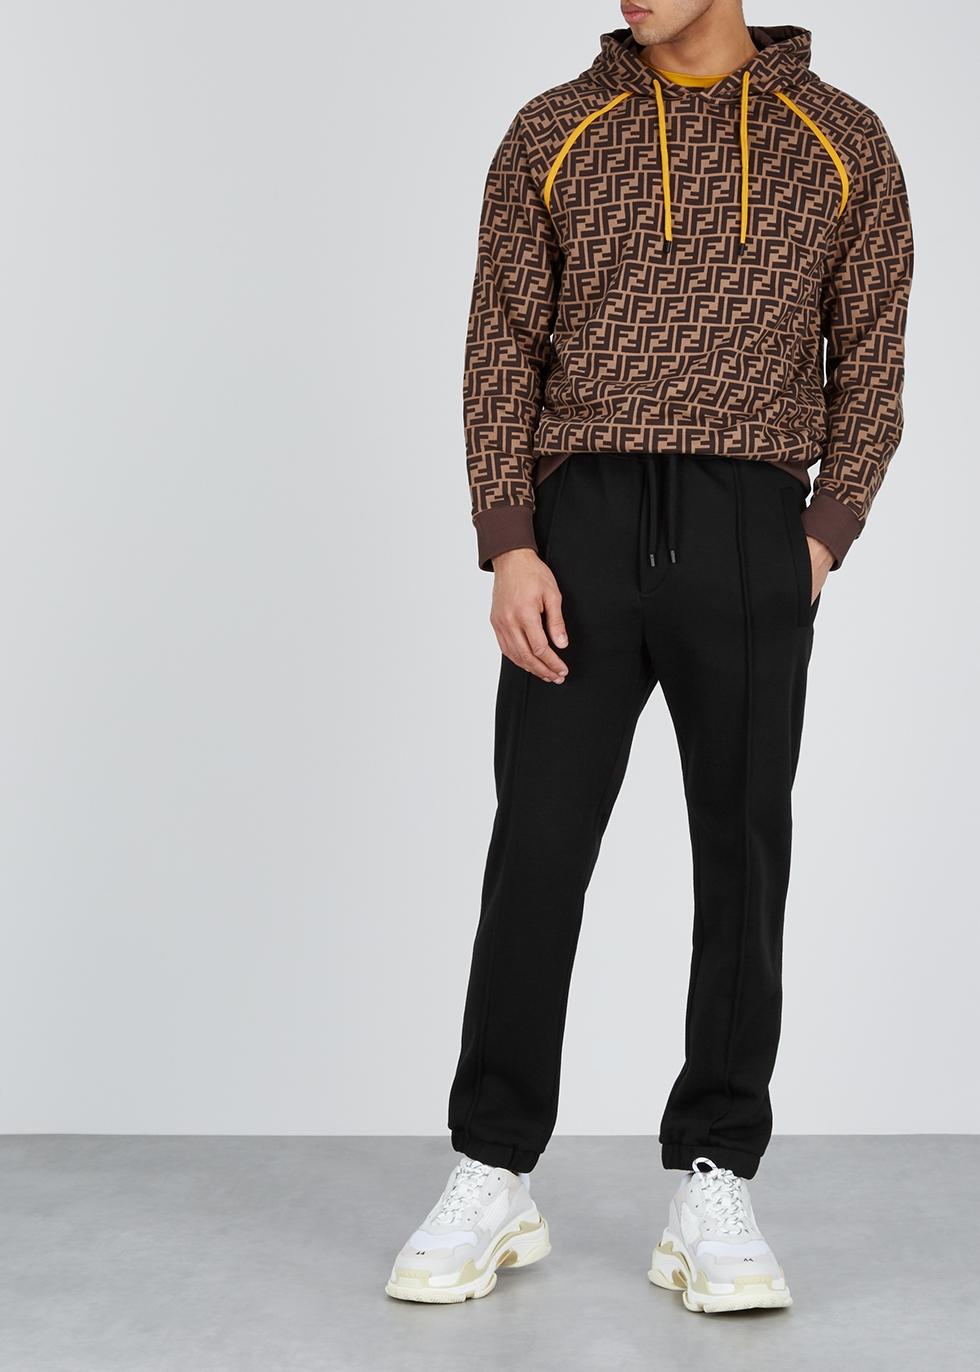 Black cotton-blend sweatpants - Fendi